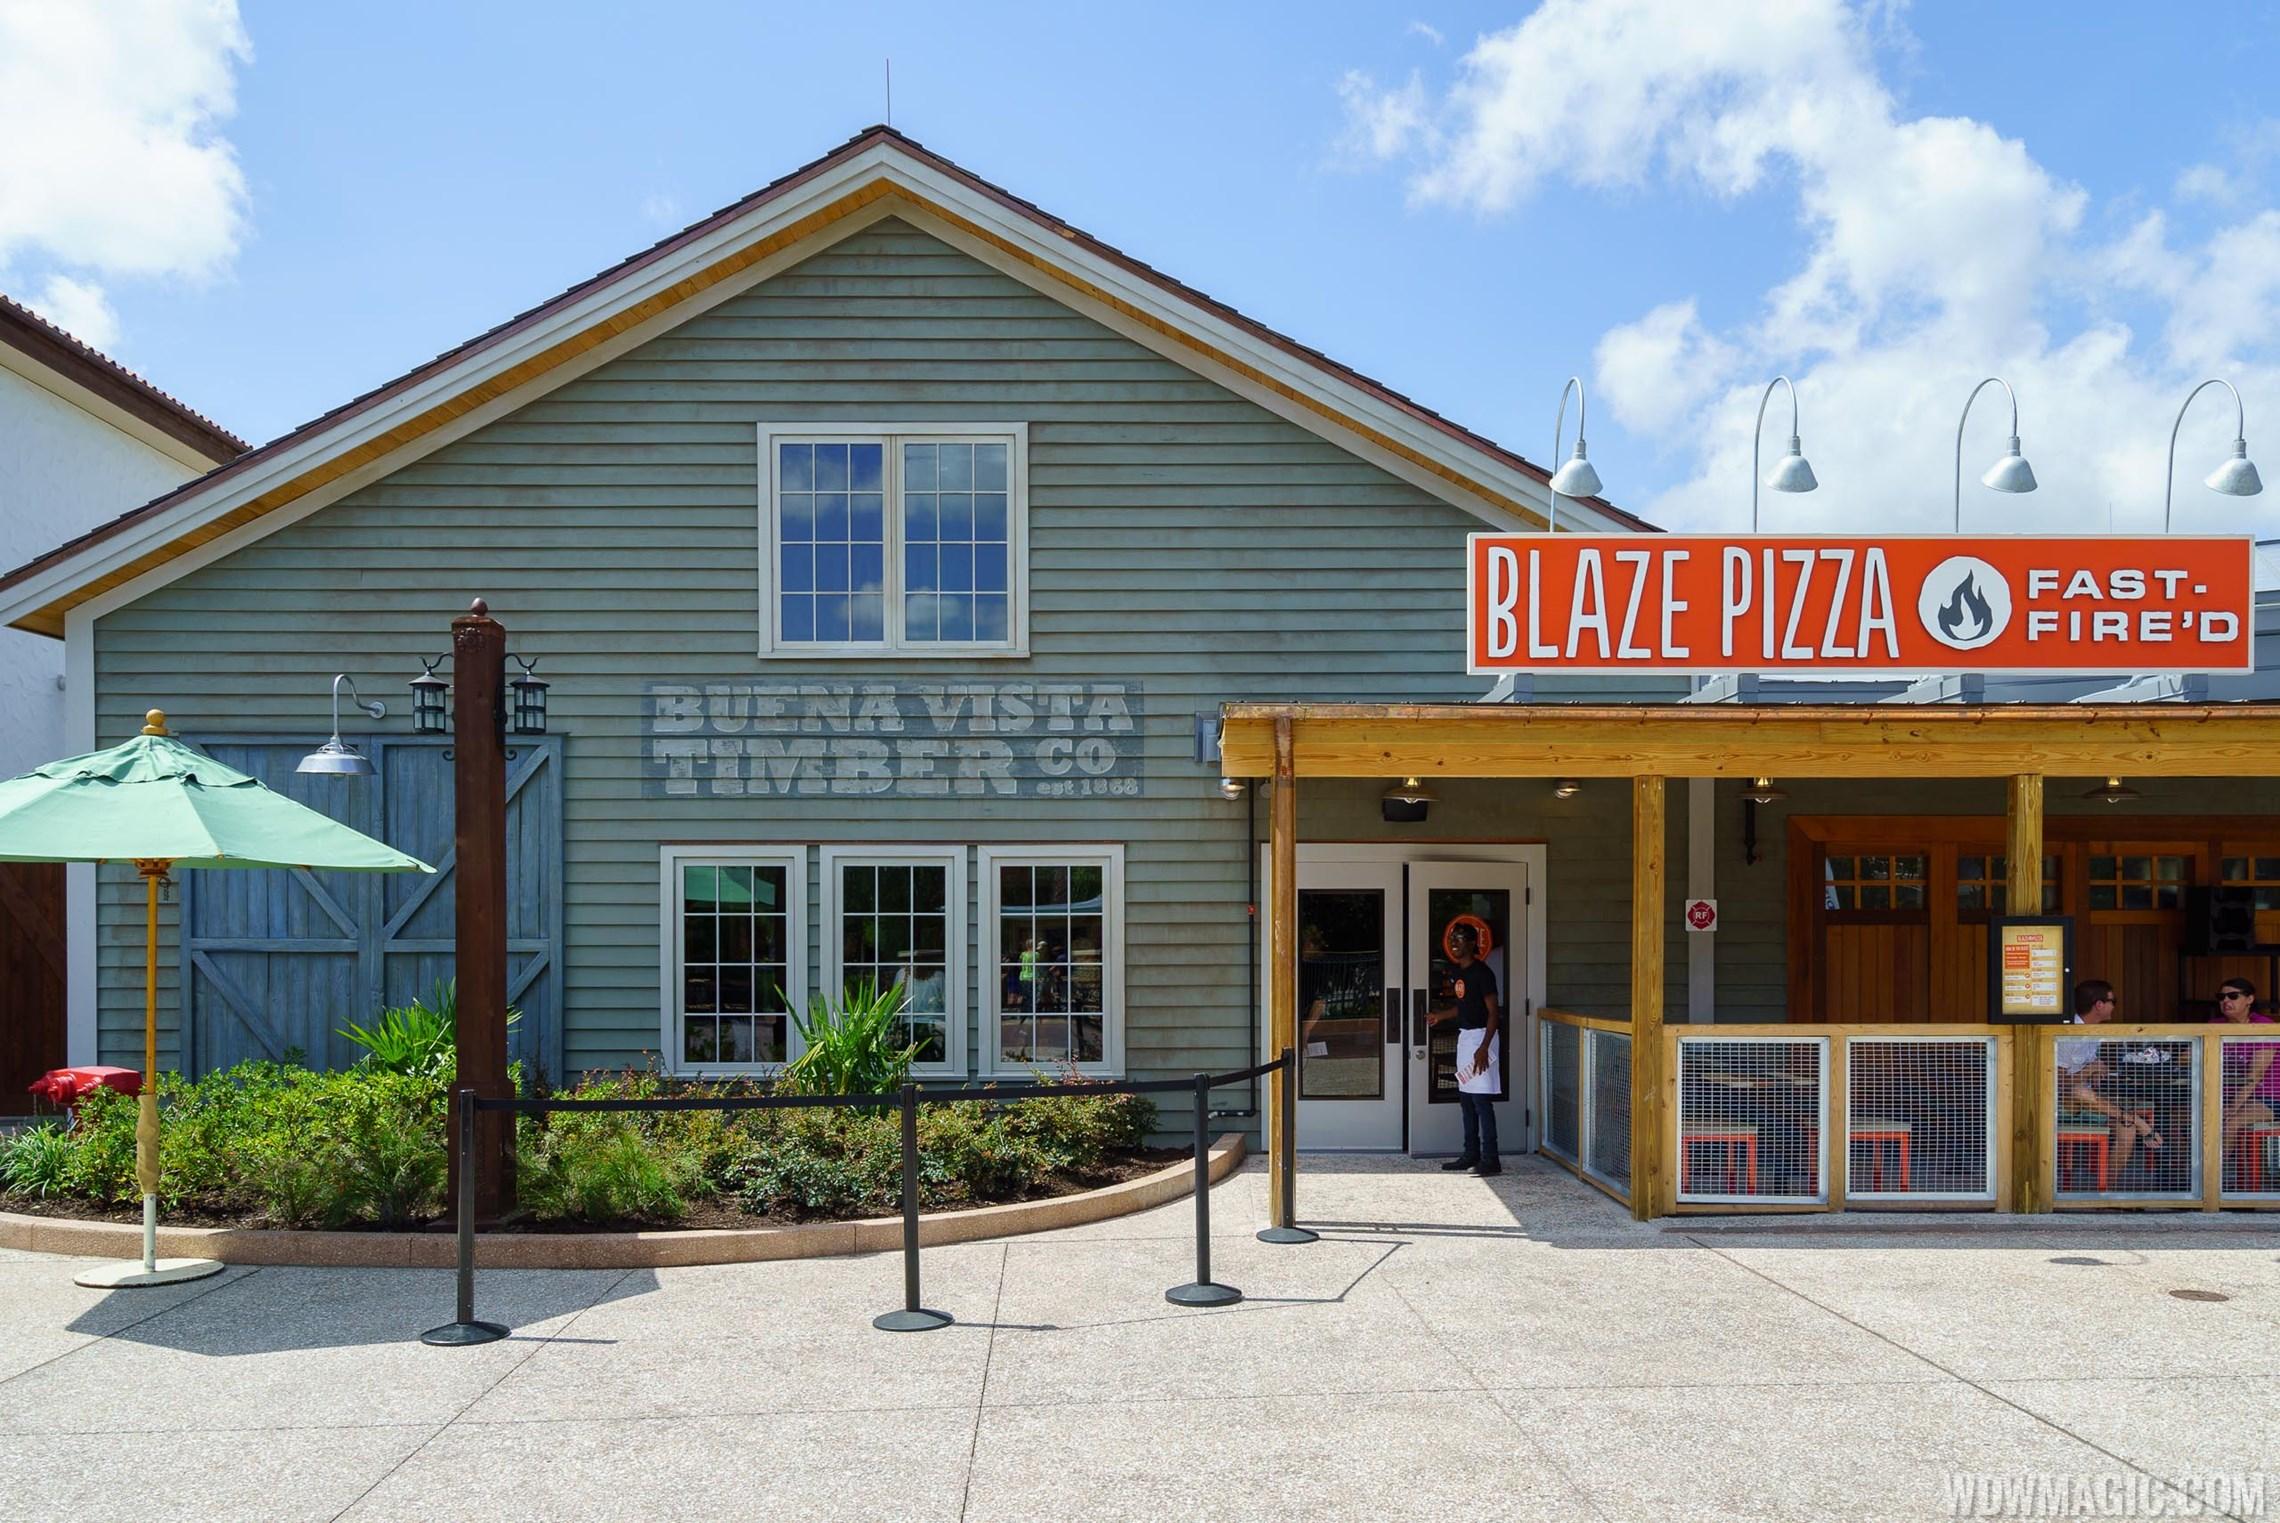 Blaze Pizza overview